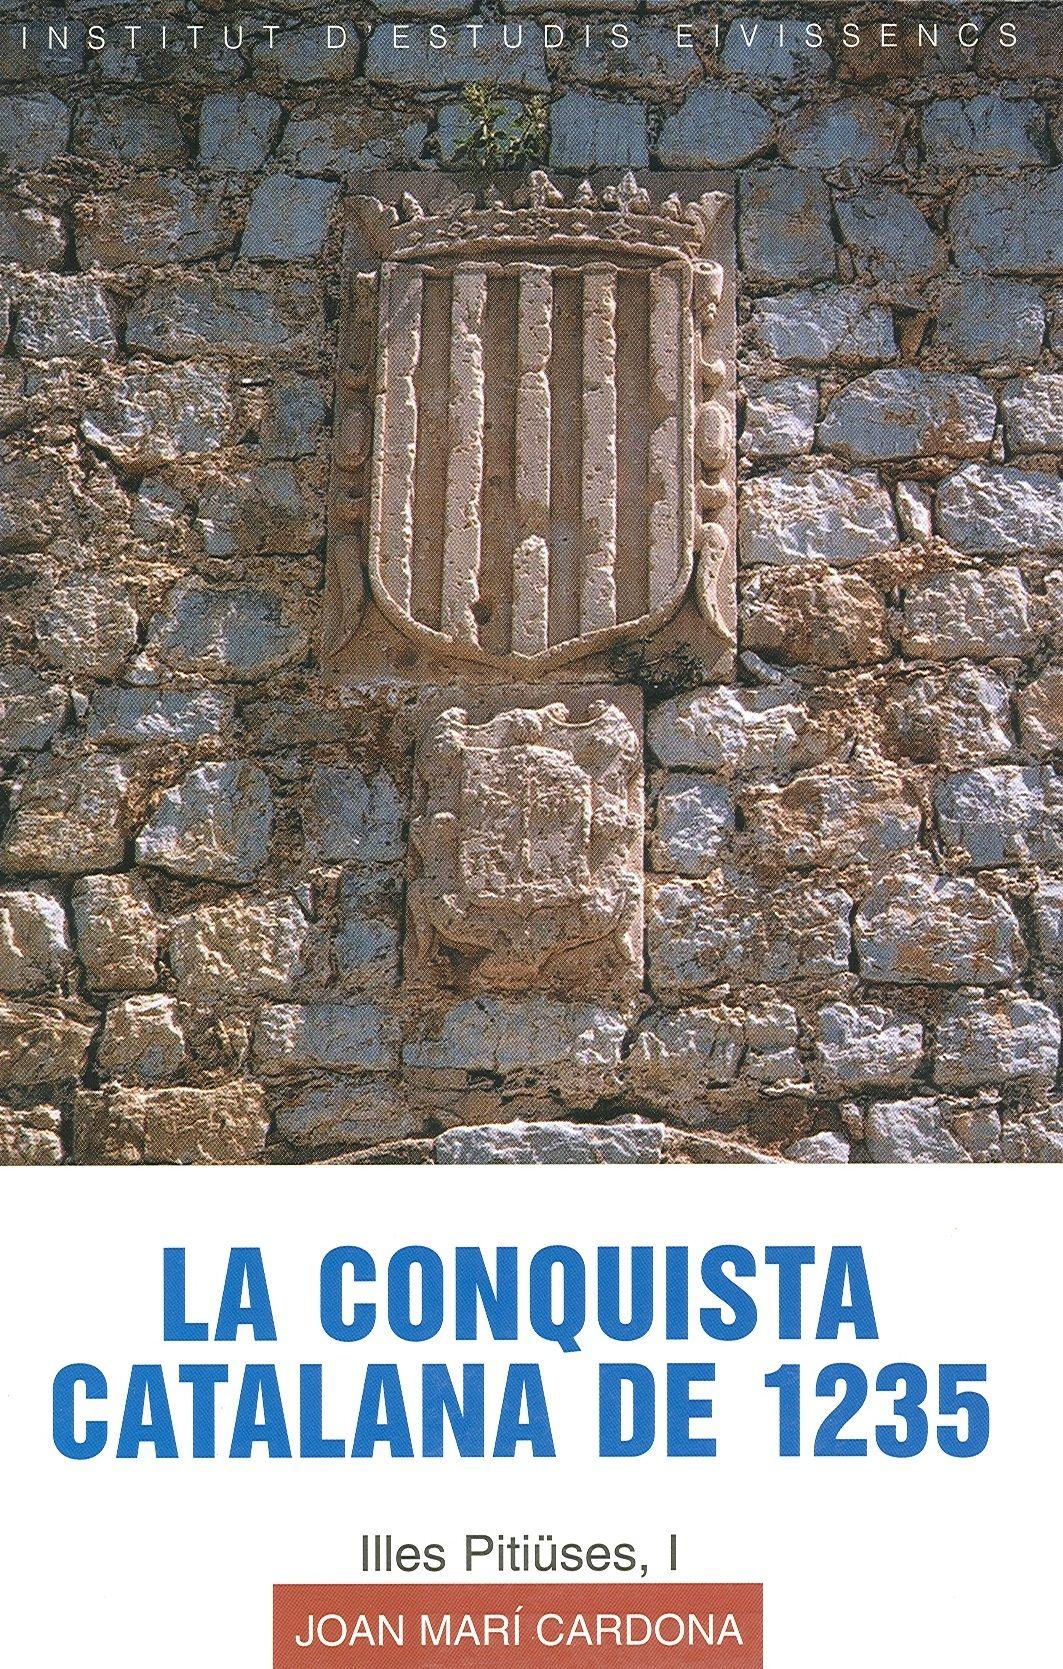 La conquista catalana de 1235